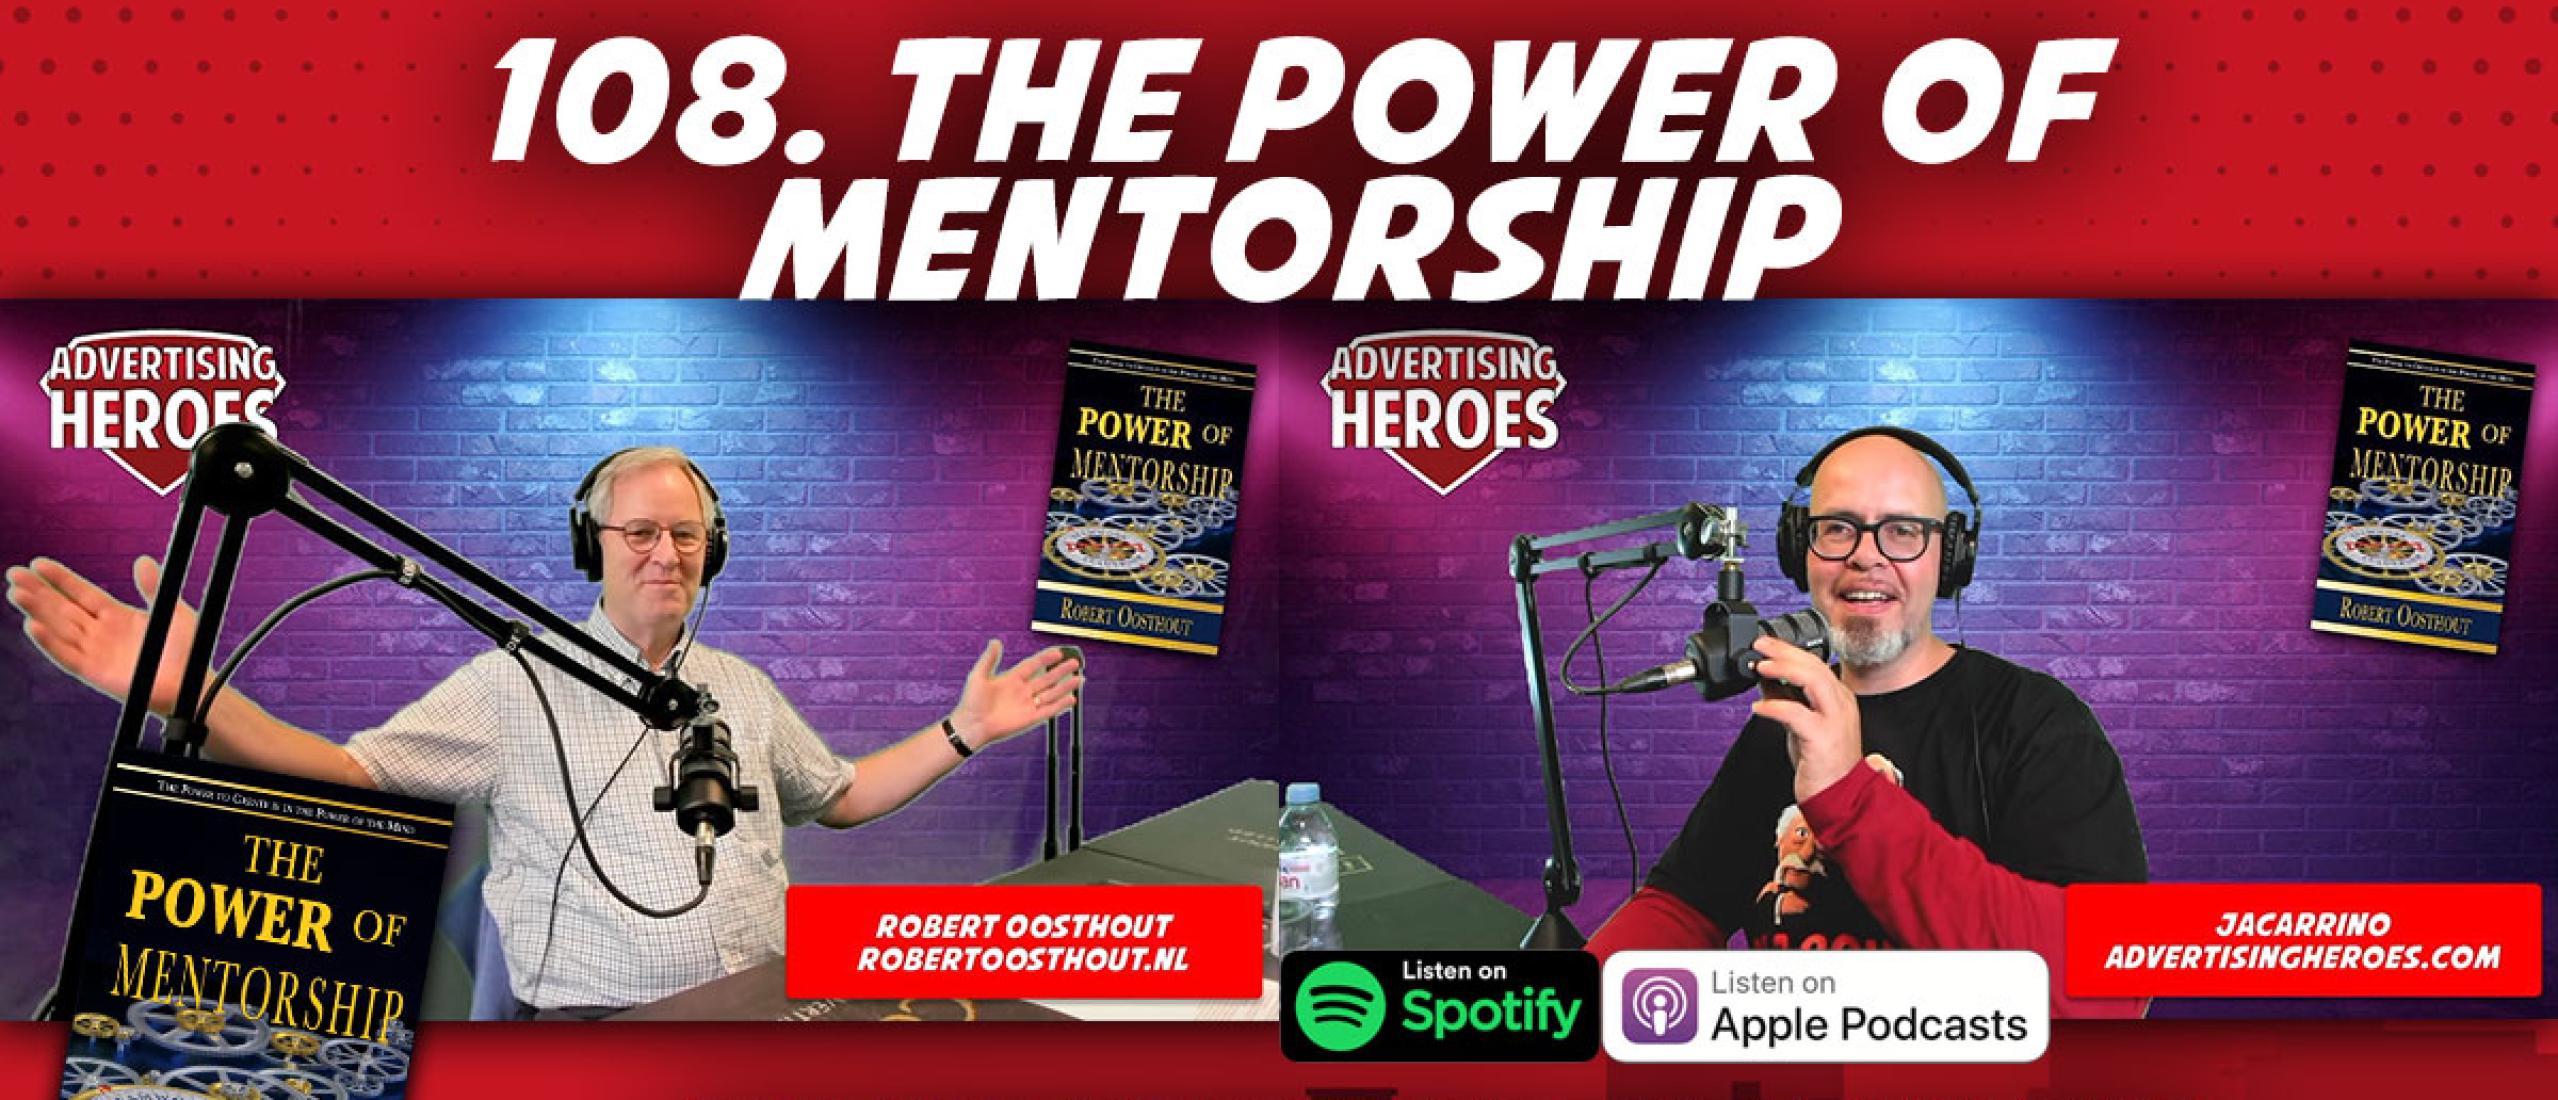 108. The Power of Mentorship - met ondernemer en auteur Robert Oosthout